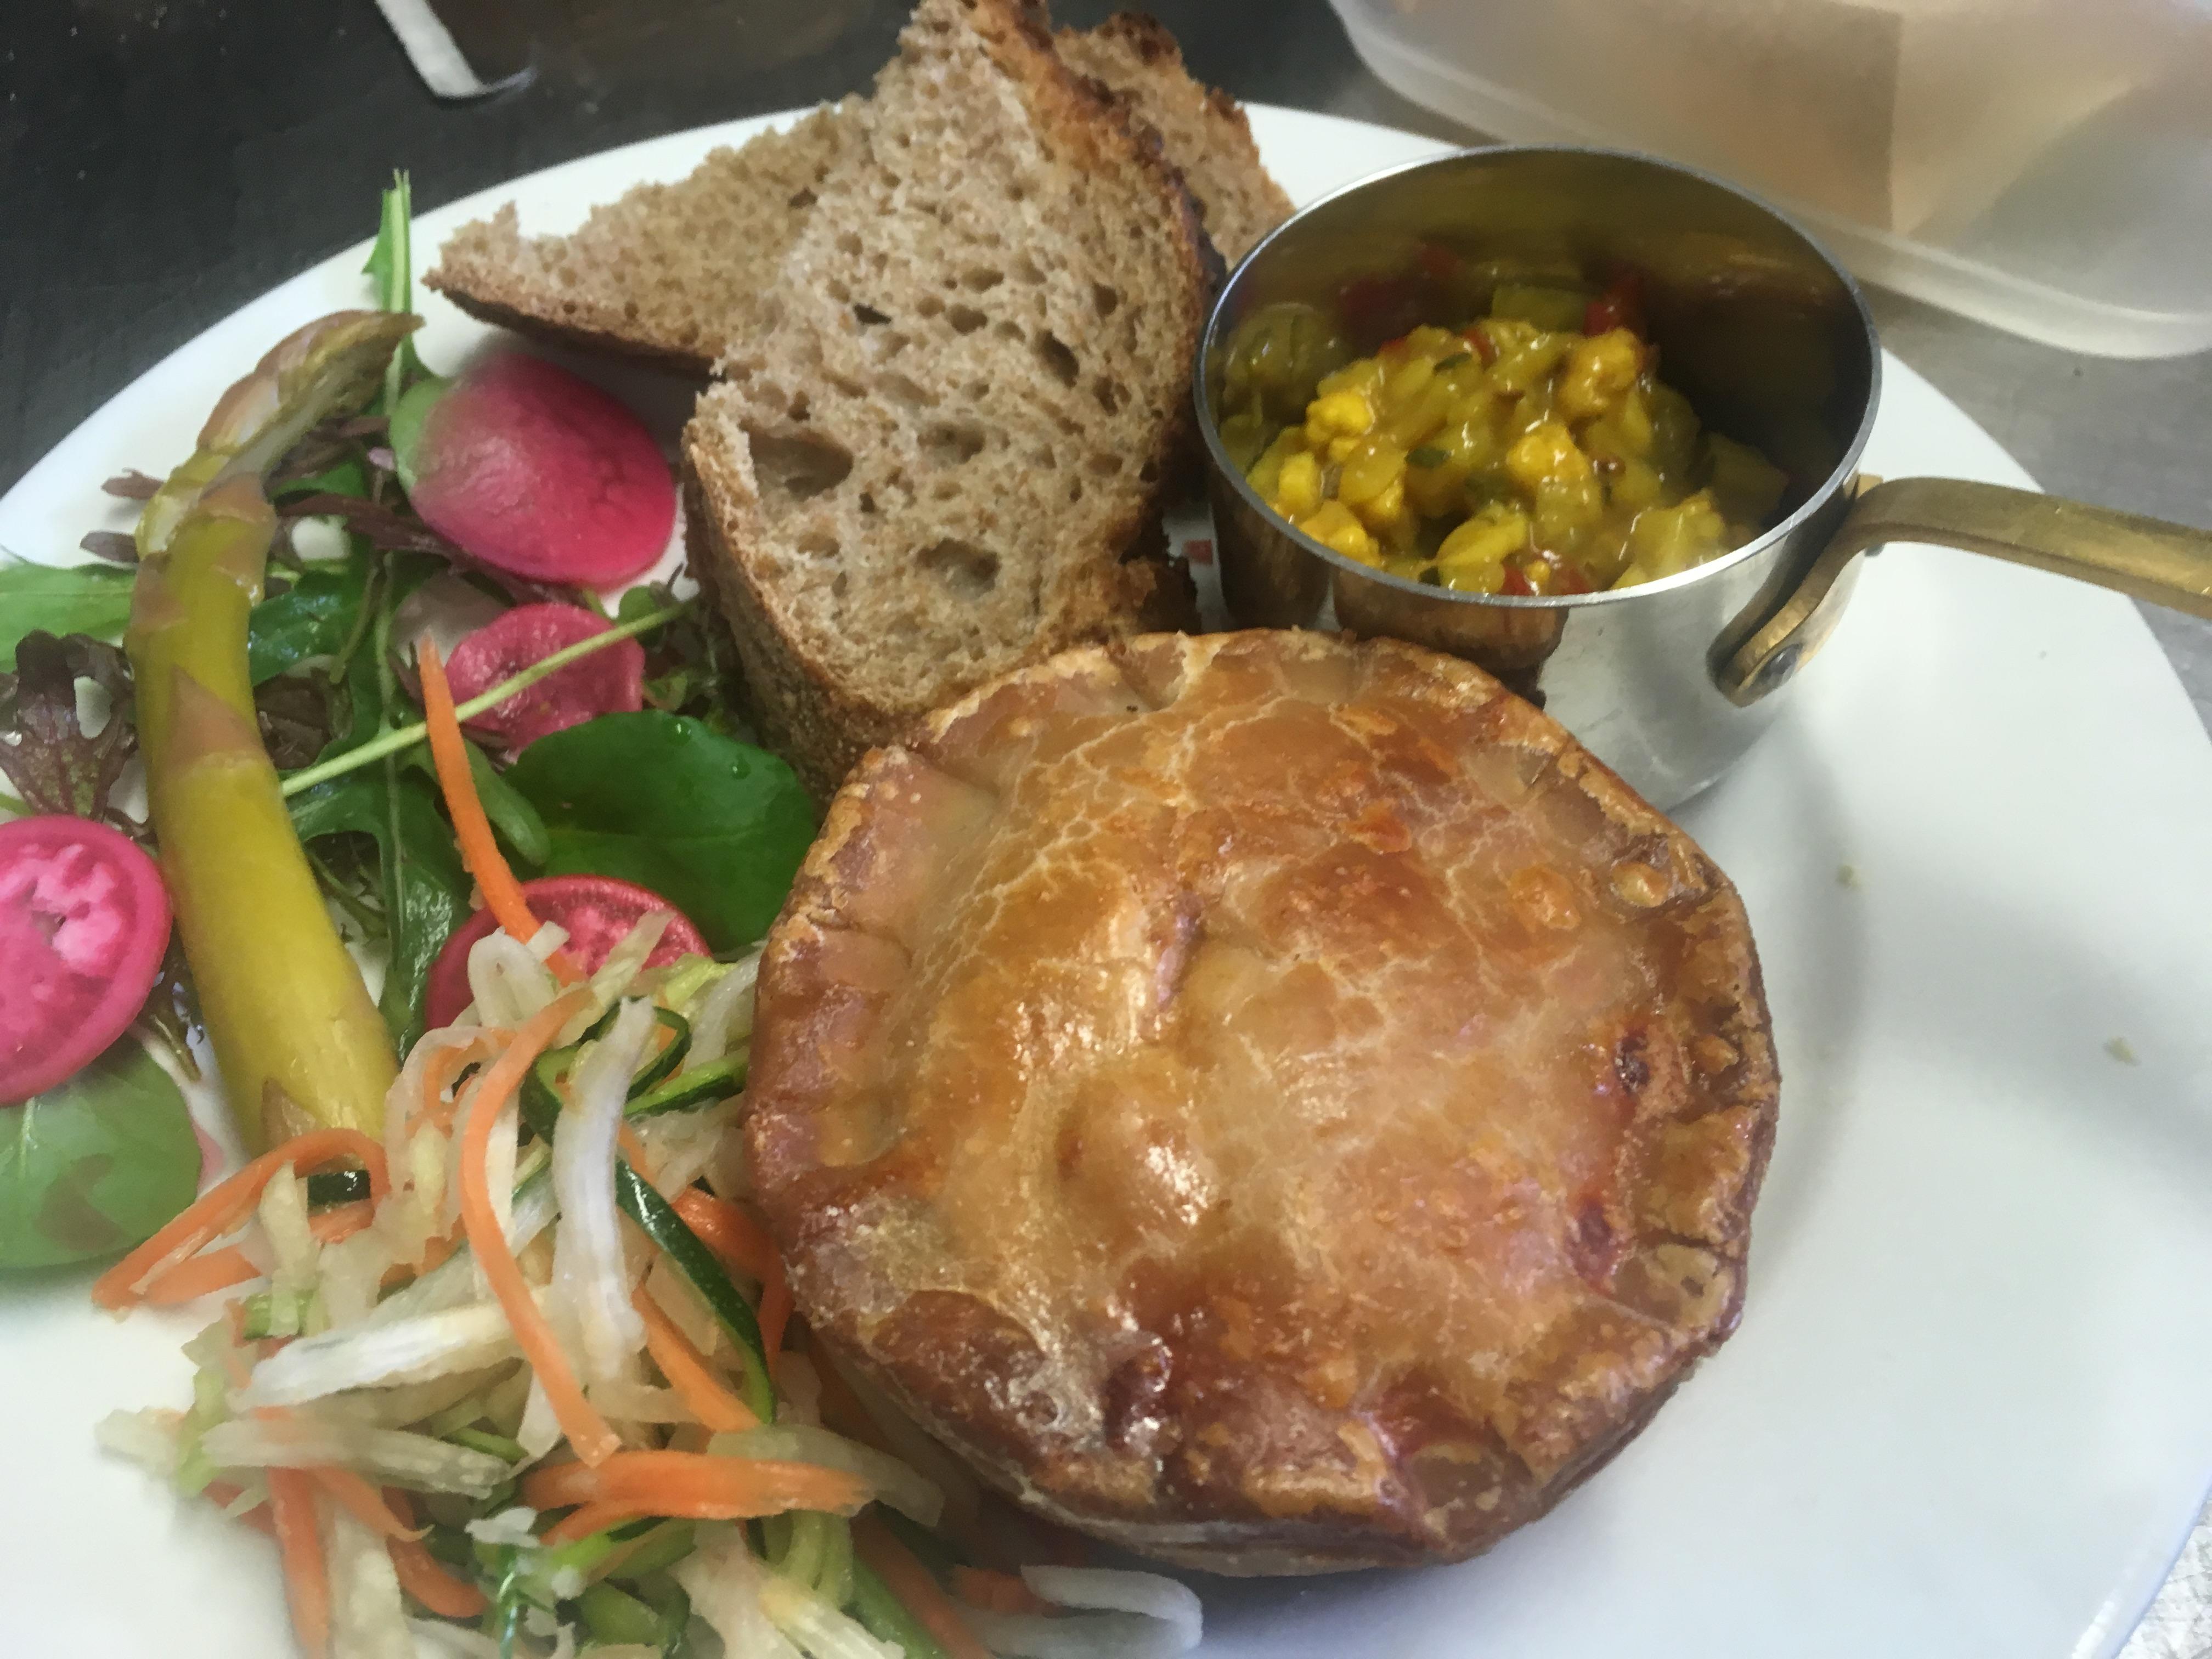 New forest pub ploughman - Crow Farm Pork Pie